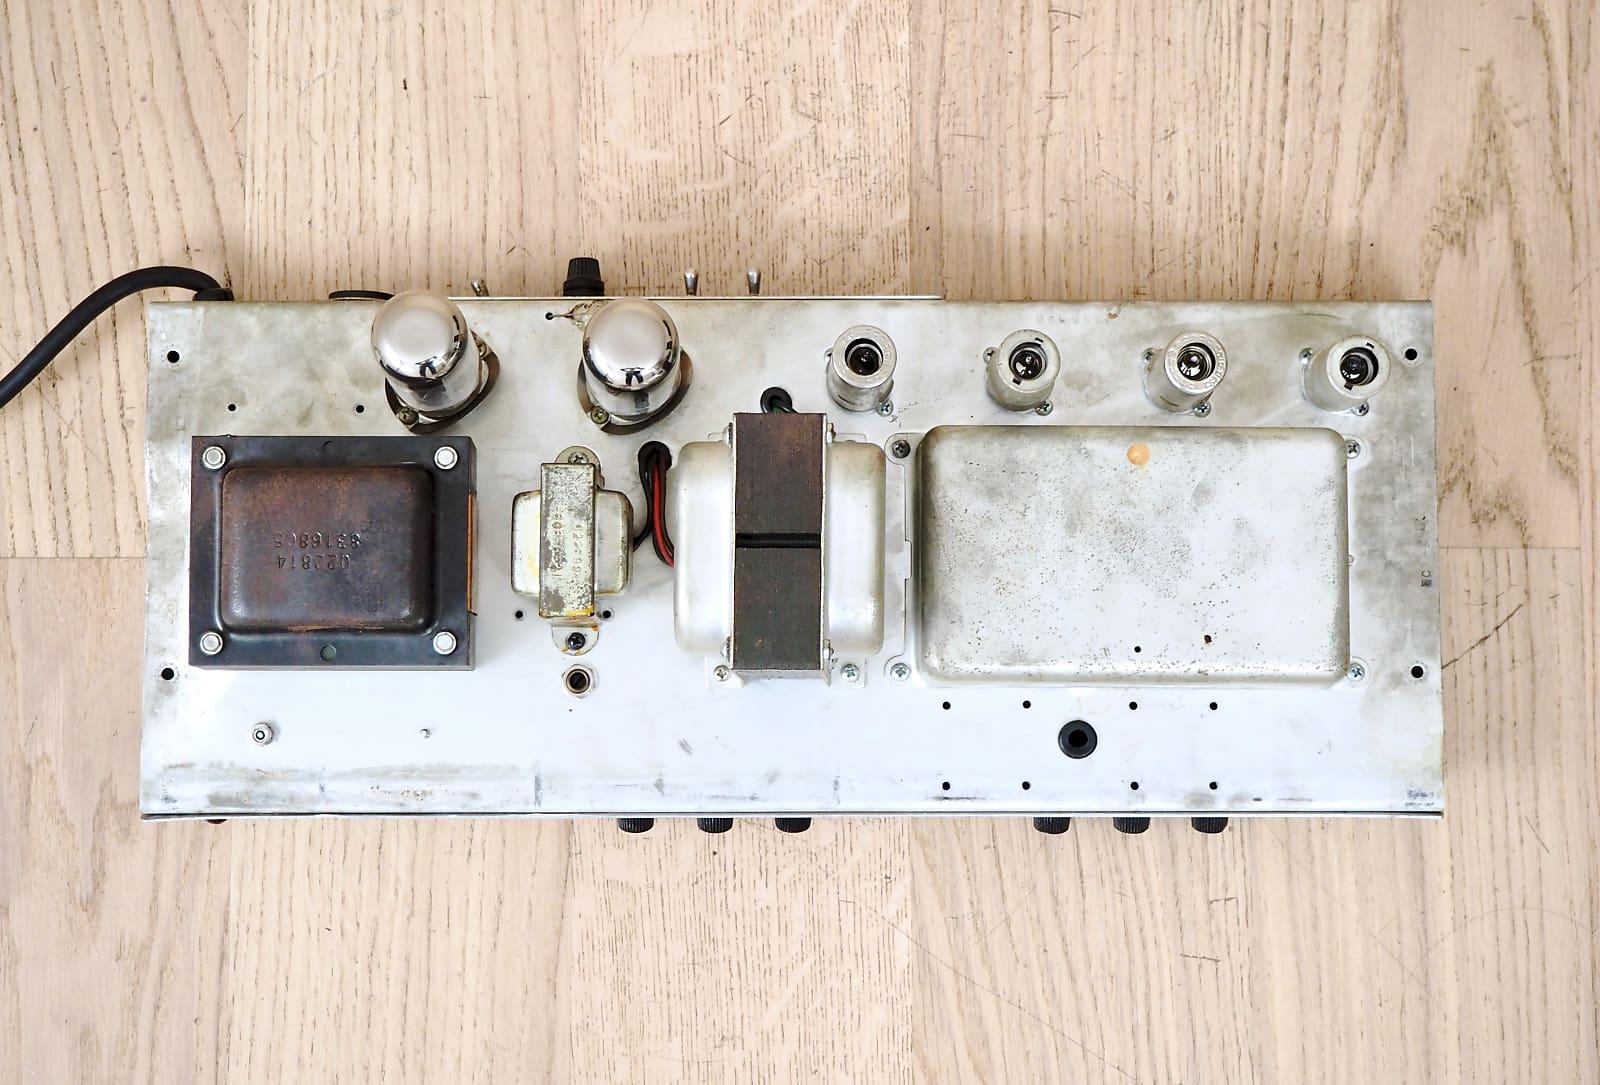 1968 Fender Bassman Vintage Tube Amp Head Silverface Drip Edge Serviced